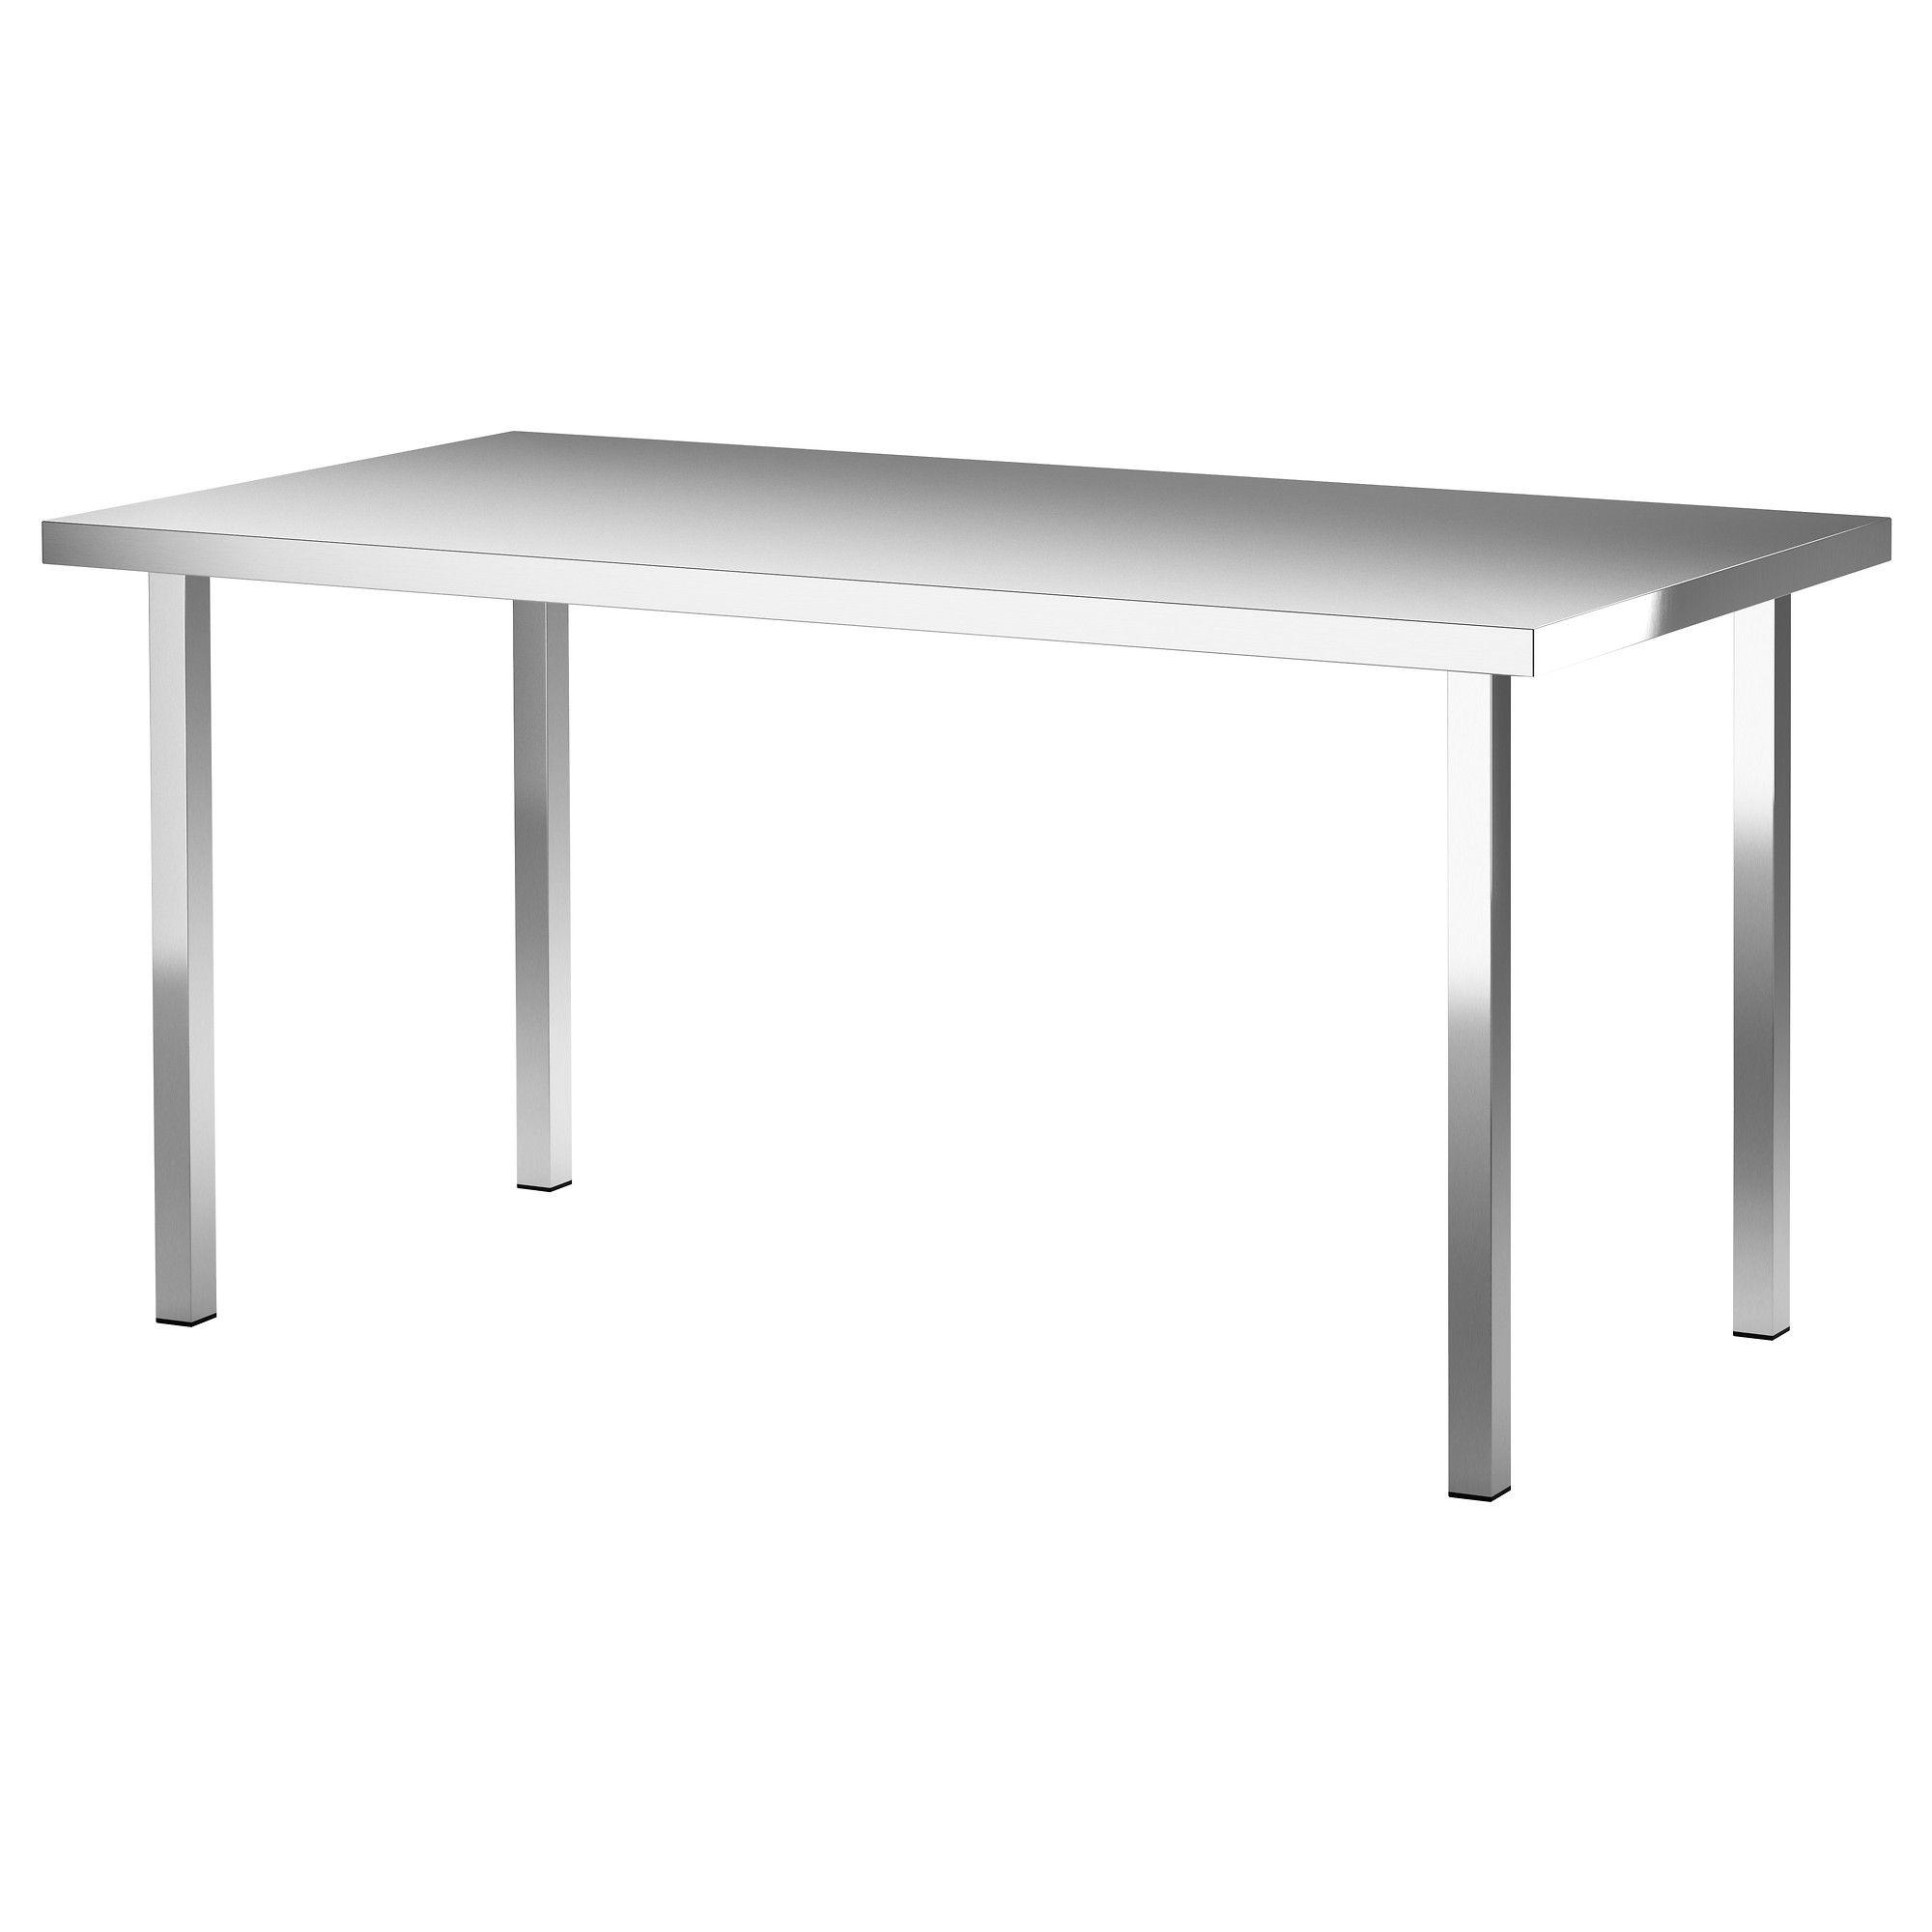 Folding Tables Ikea Sanfrid Sjunne Table Ikea Office White Pinterest Basements